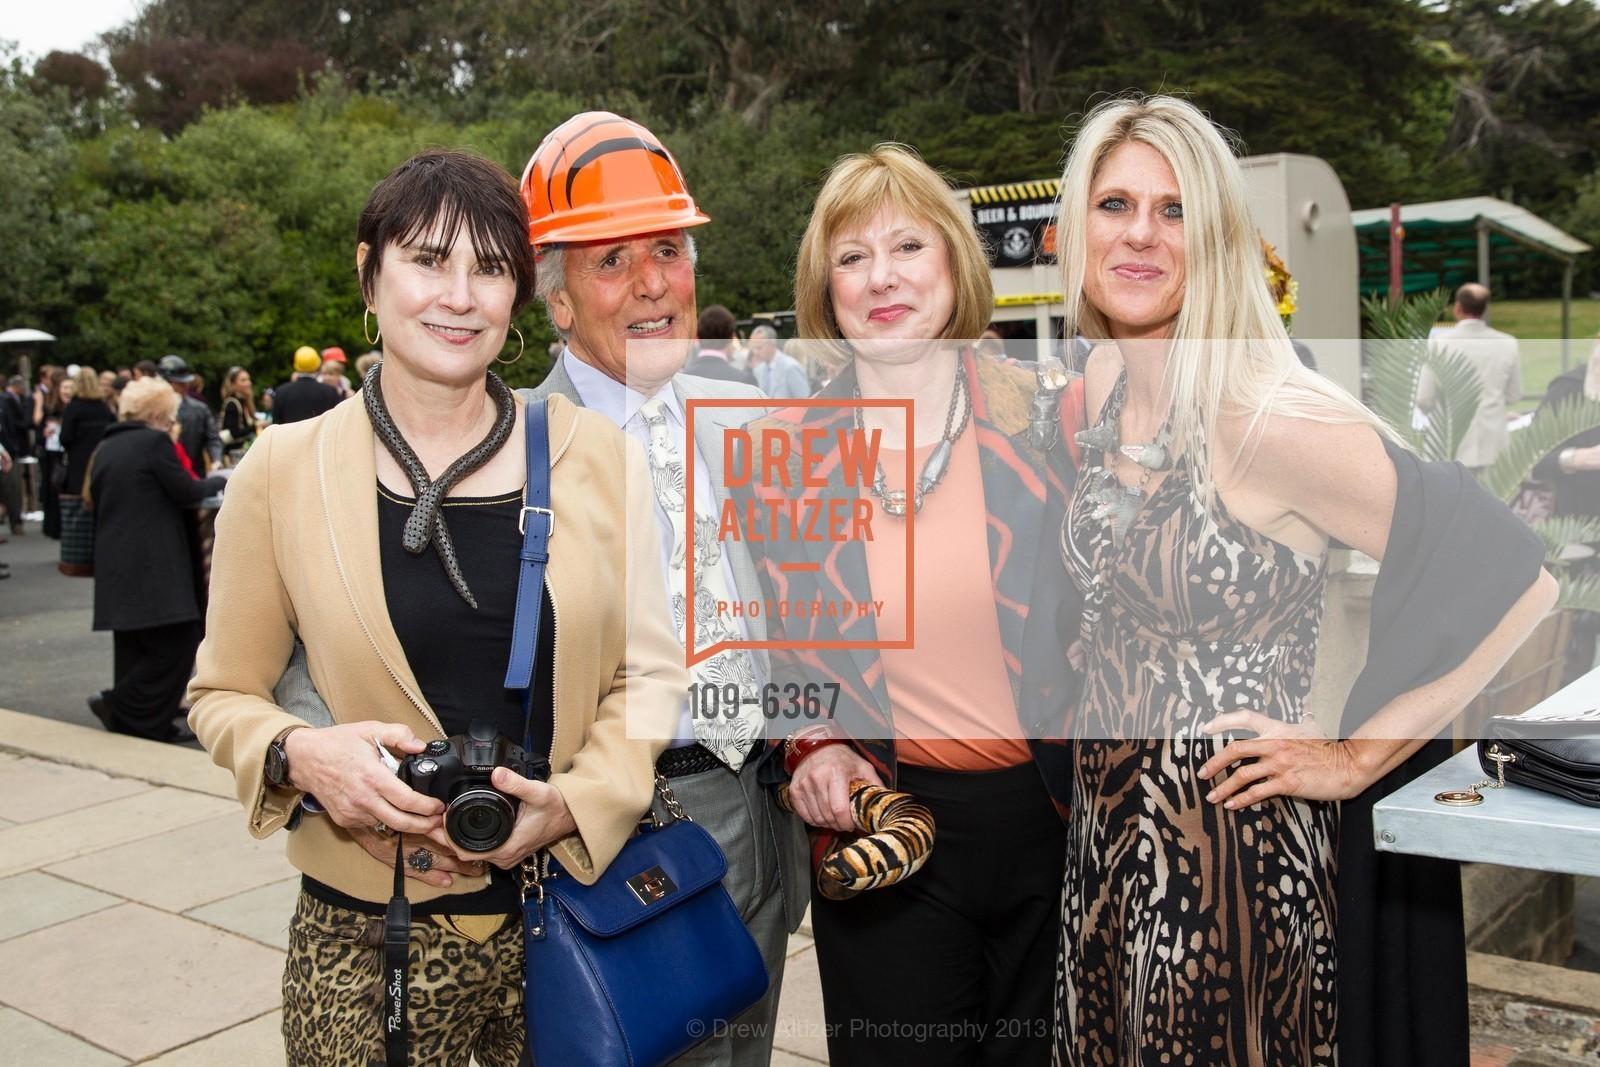 Kathleen Maher, William Beech, Susan Beech, Lori Sebastian, ZooFest 2013 Hard Hat & Tails, US, May 11th, 2013